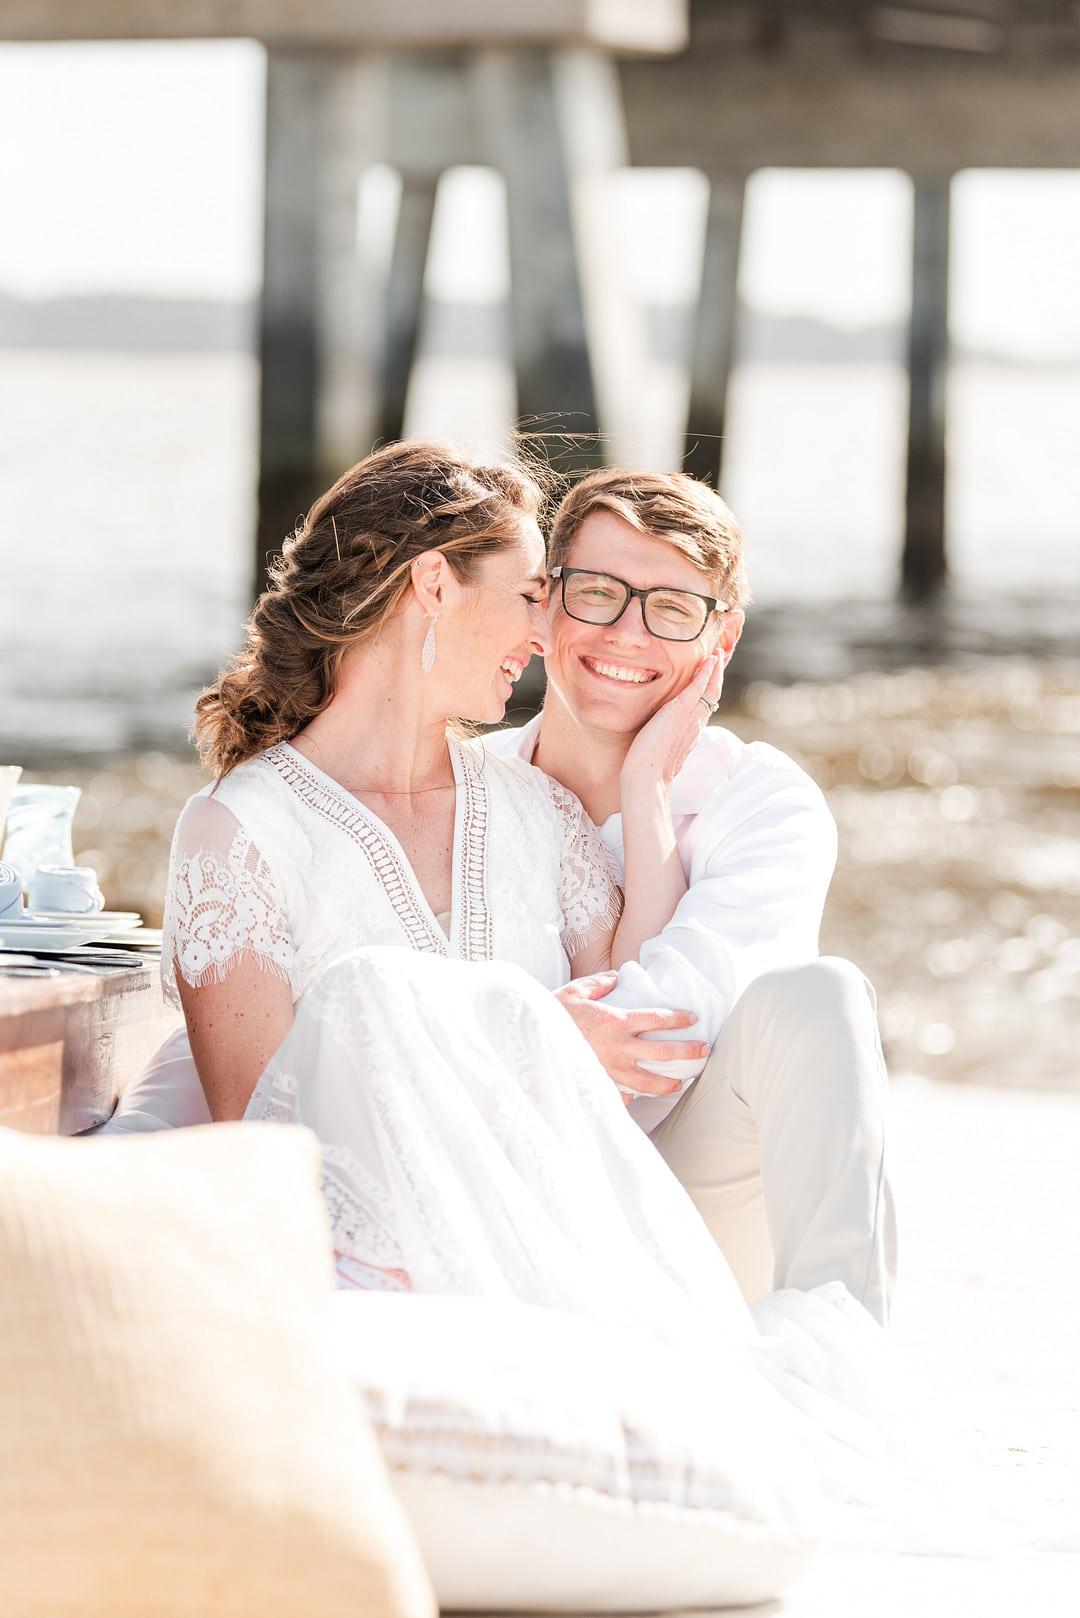 bride and groom cuddling on the beach for the amelia island beach wedding inspiration shoot